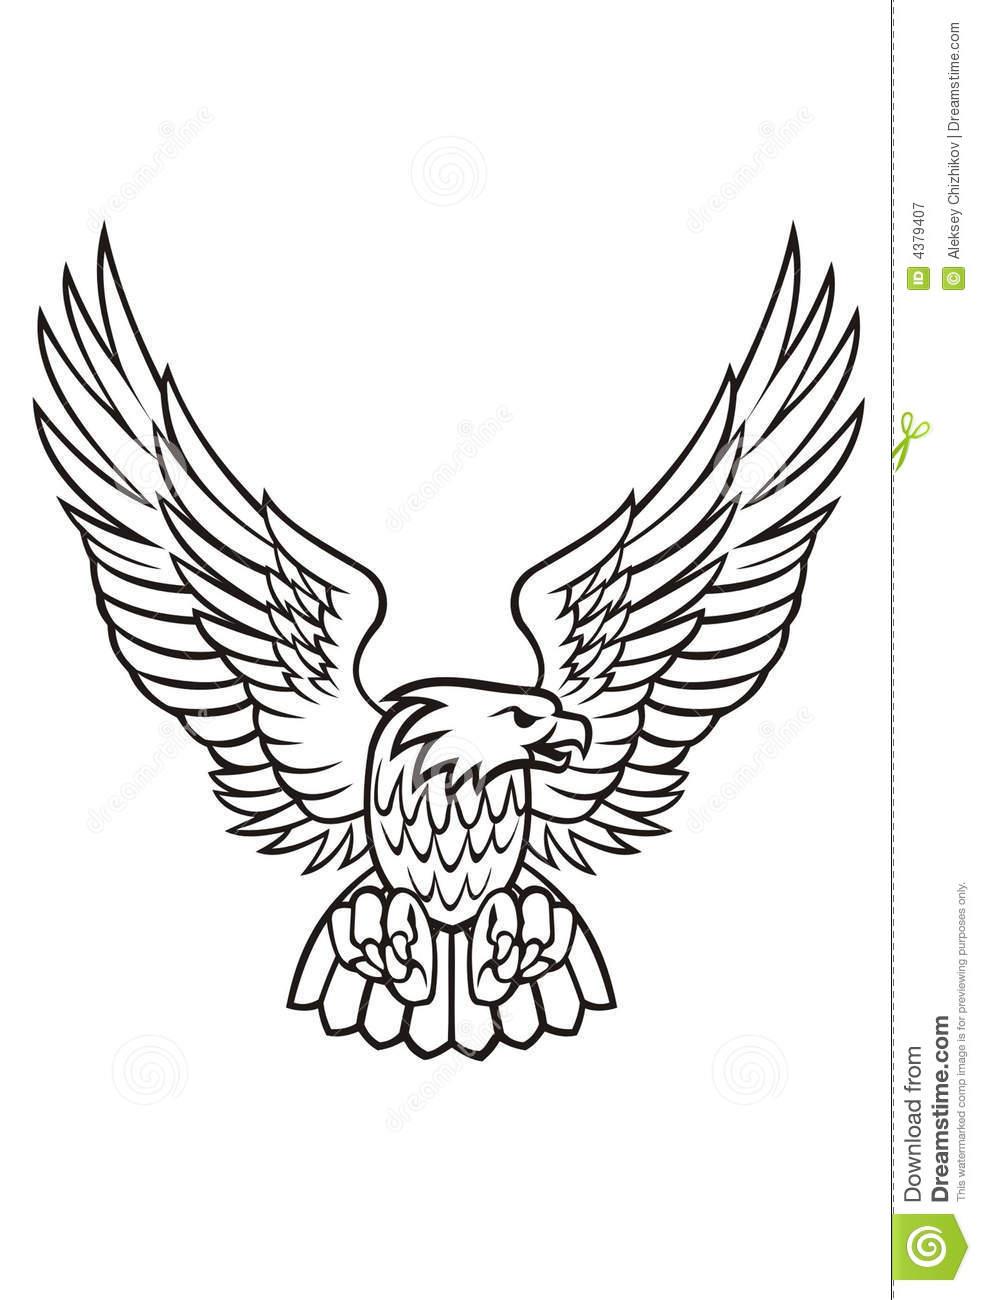 Black Eagle clipart spread eagle White black art with collection